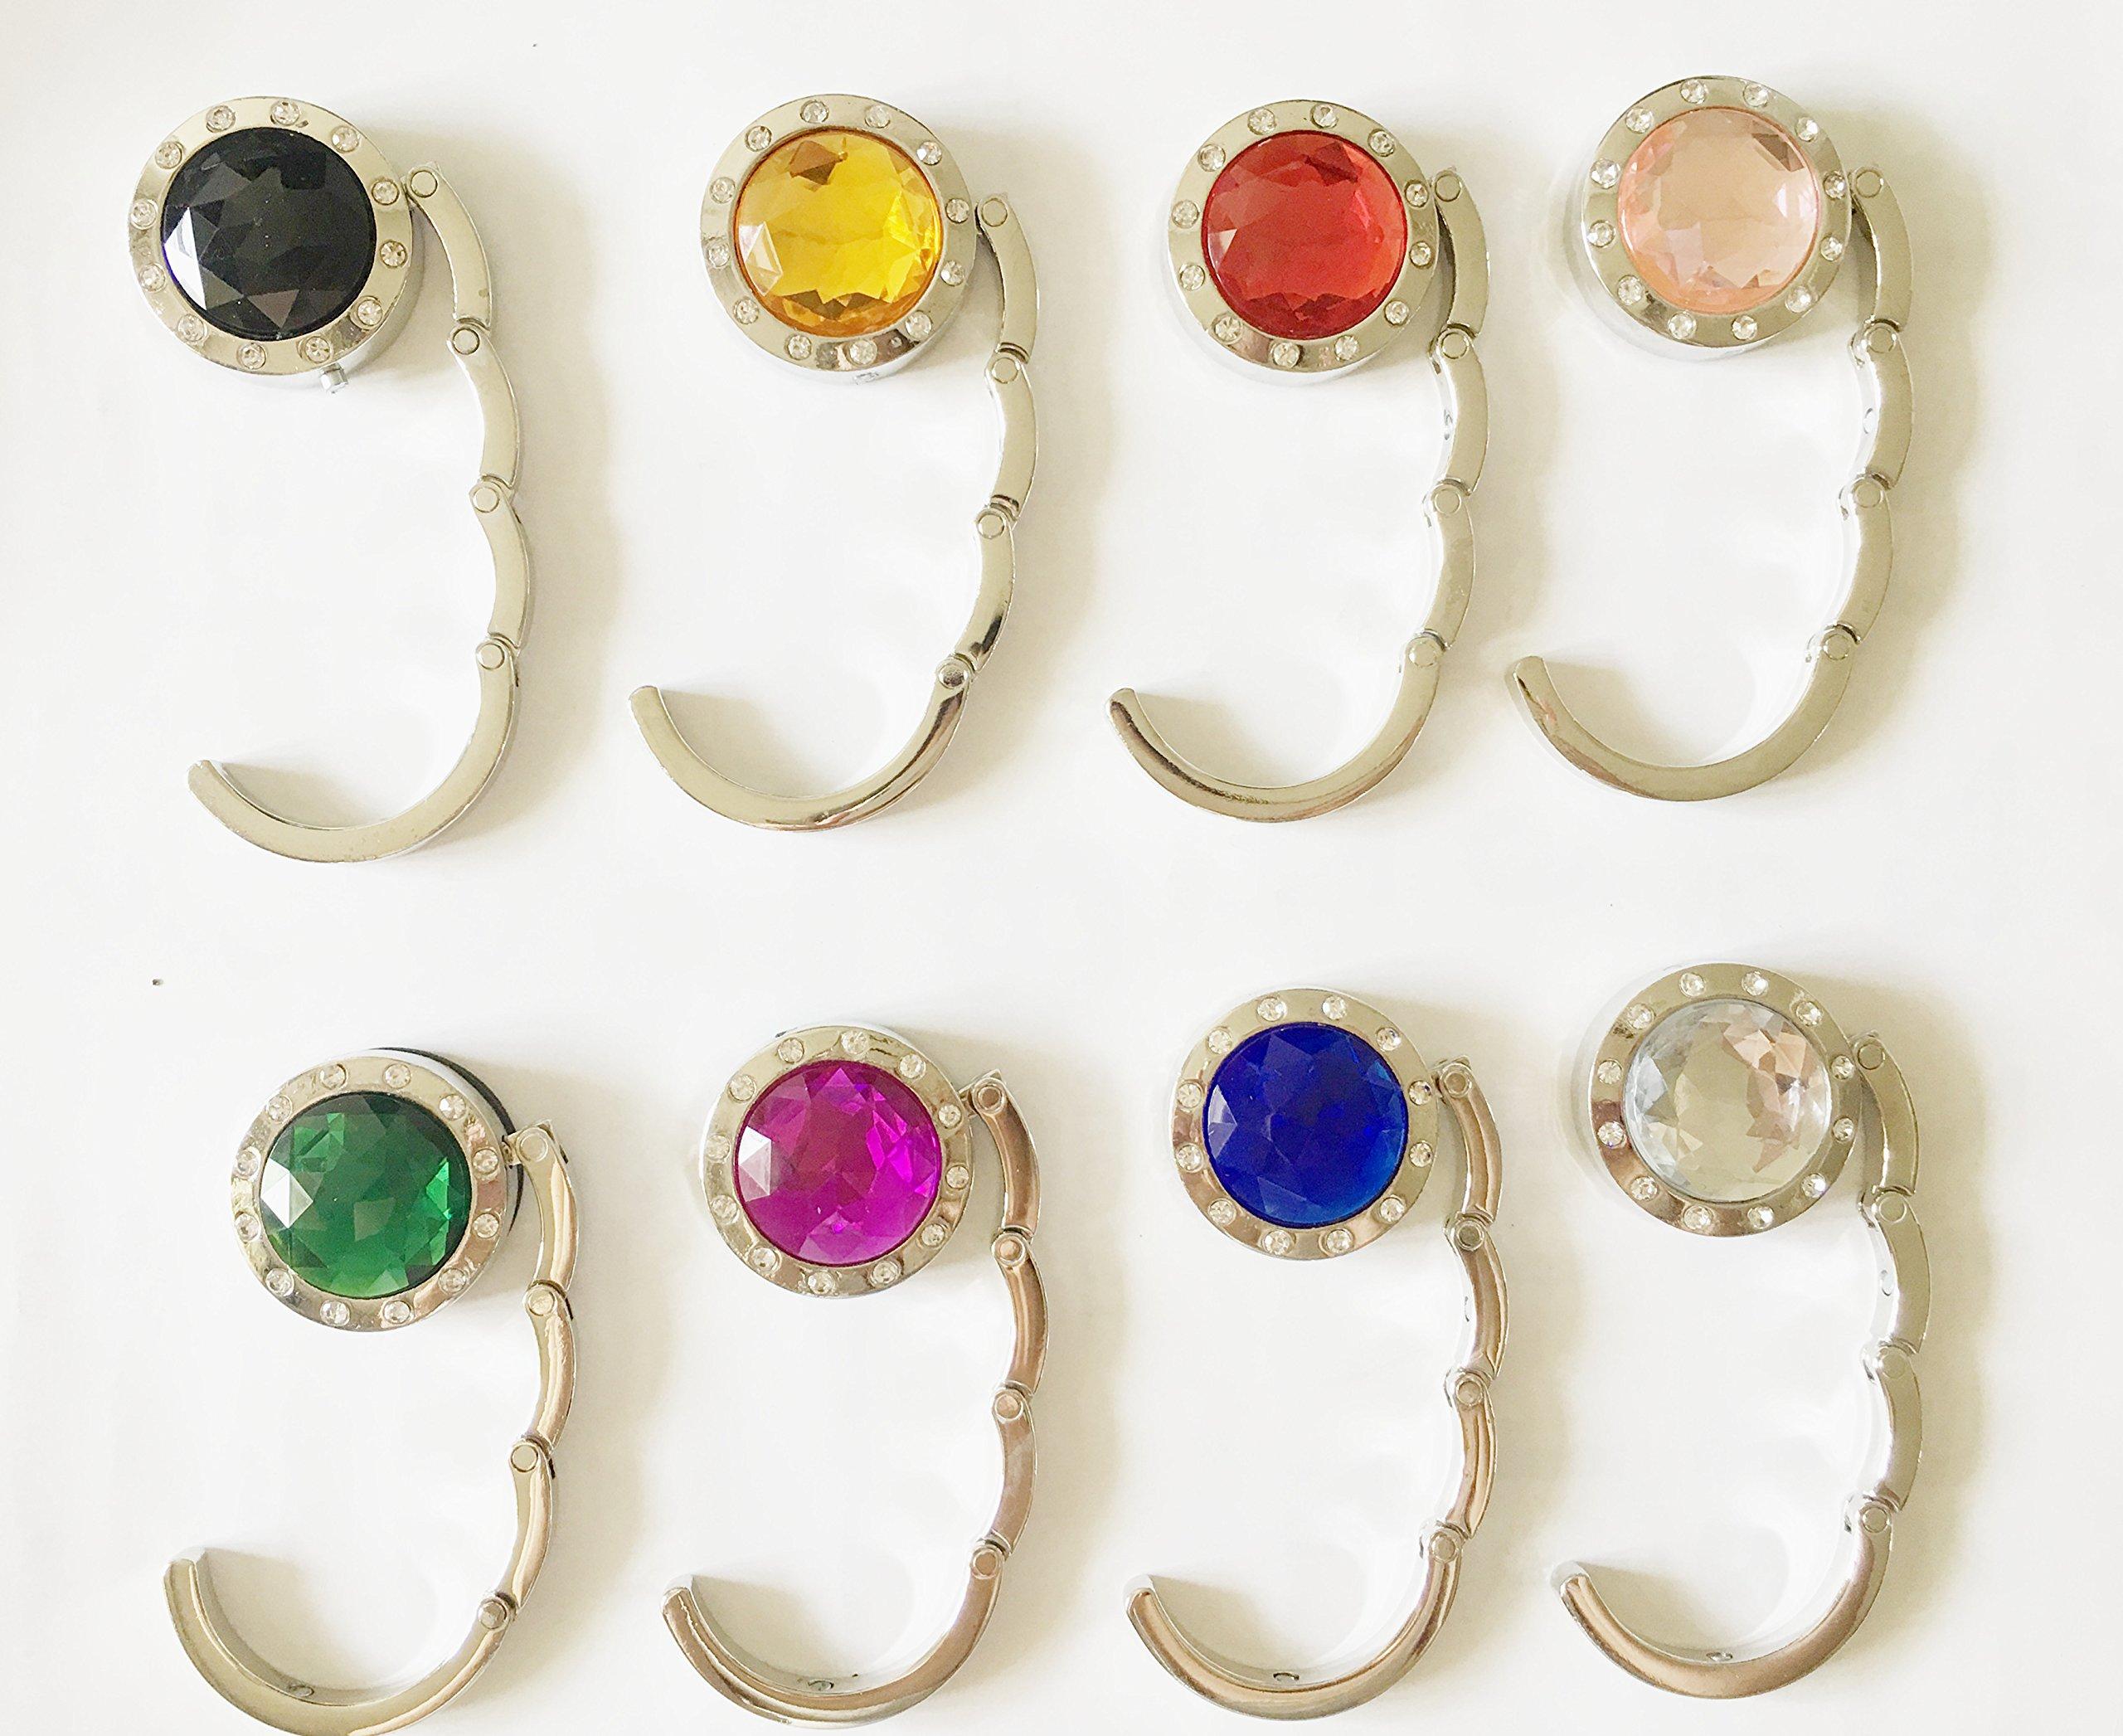 Zungtin 8 pcs Colorful Purse Hooks Crystal Diamond Folding Storage Handbag Hook